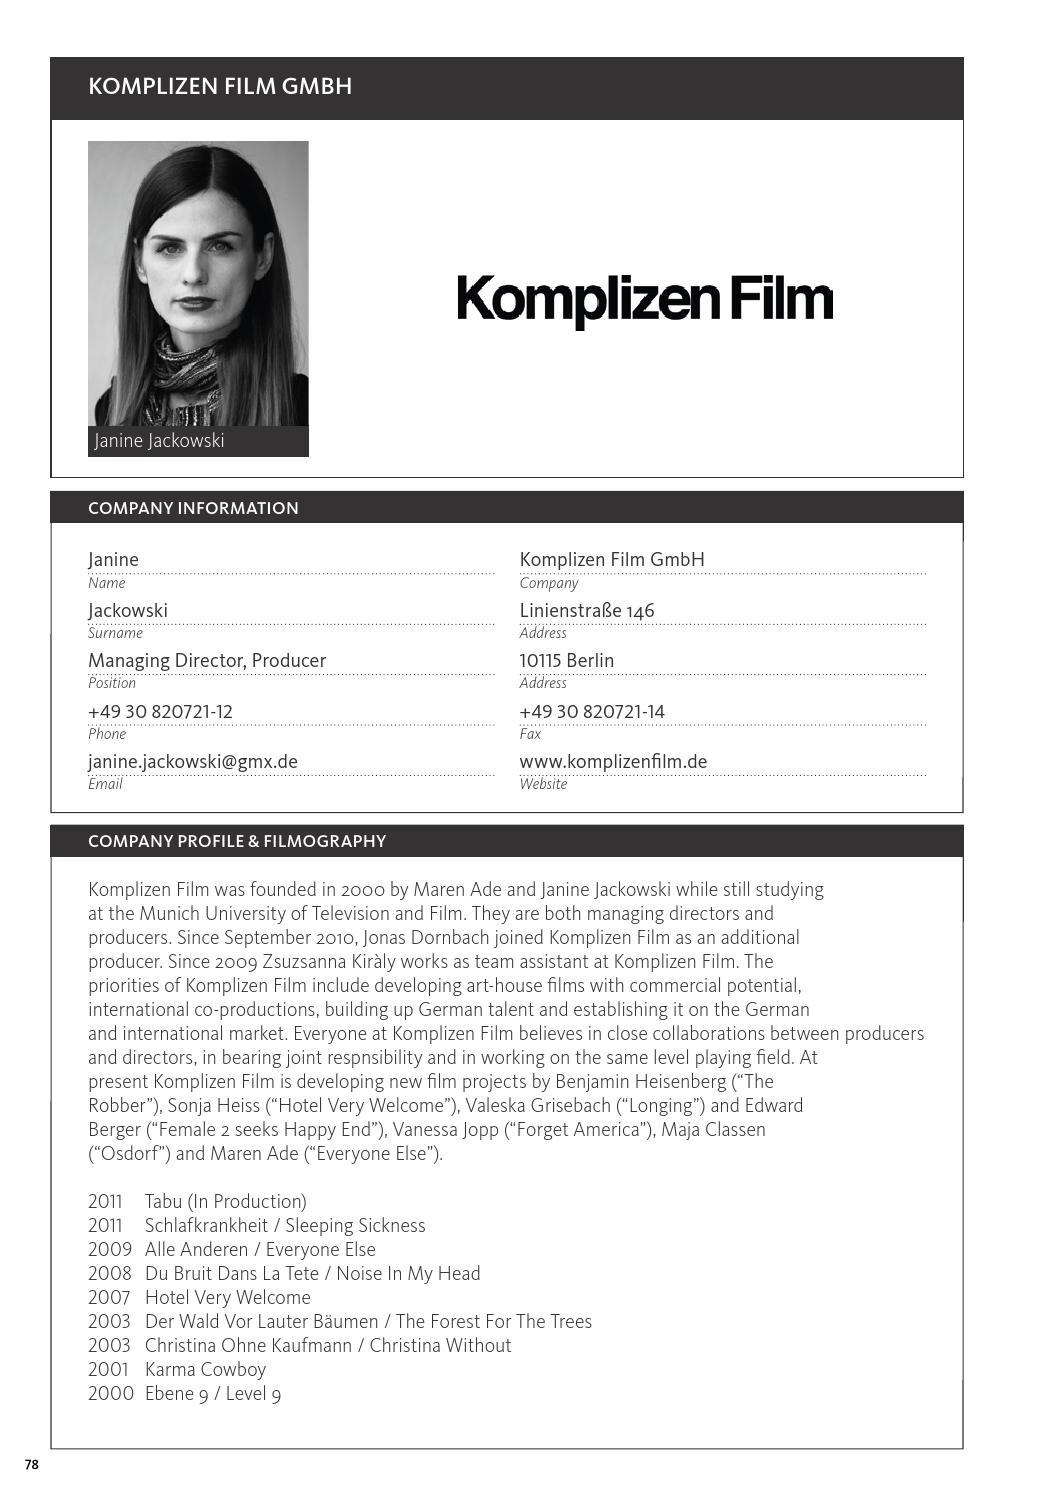 Alle Anderen 2009 incontri #1idm film fund & commission - issuu